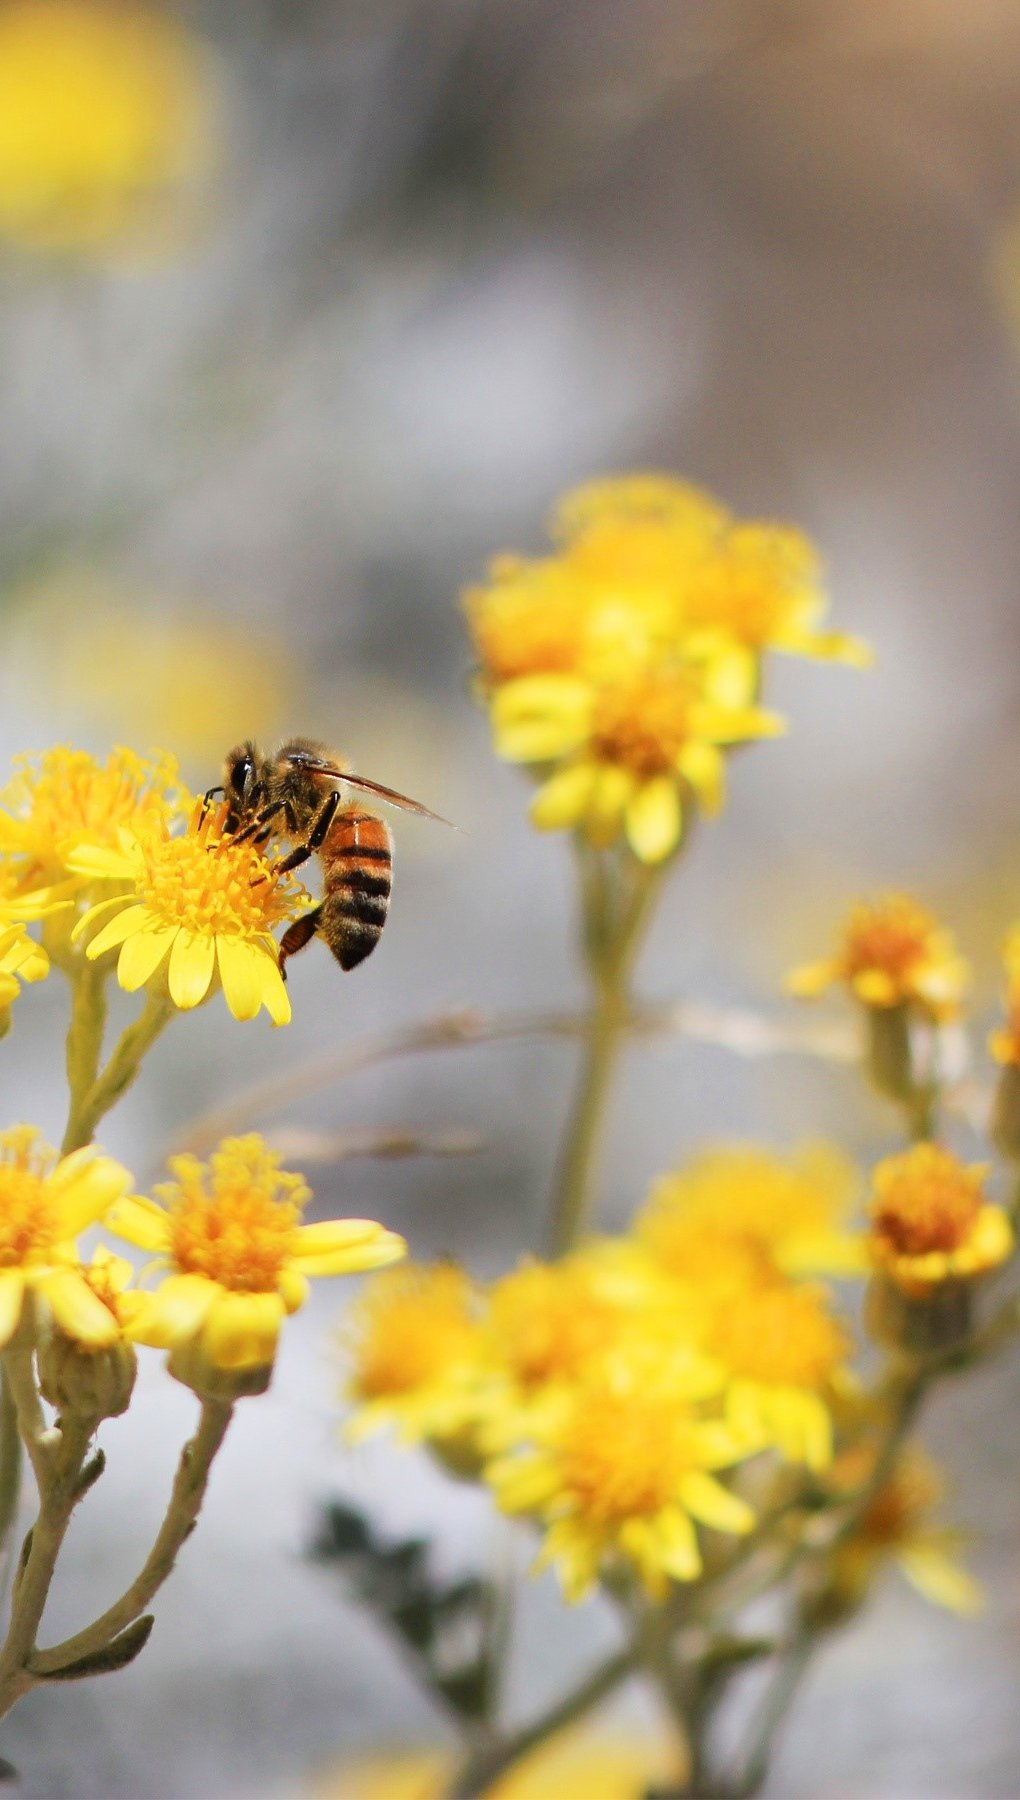 Fondos de pantalla Una abeja en un jardín Vertical